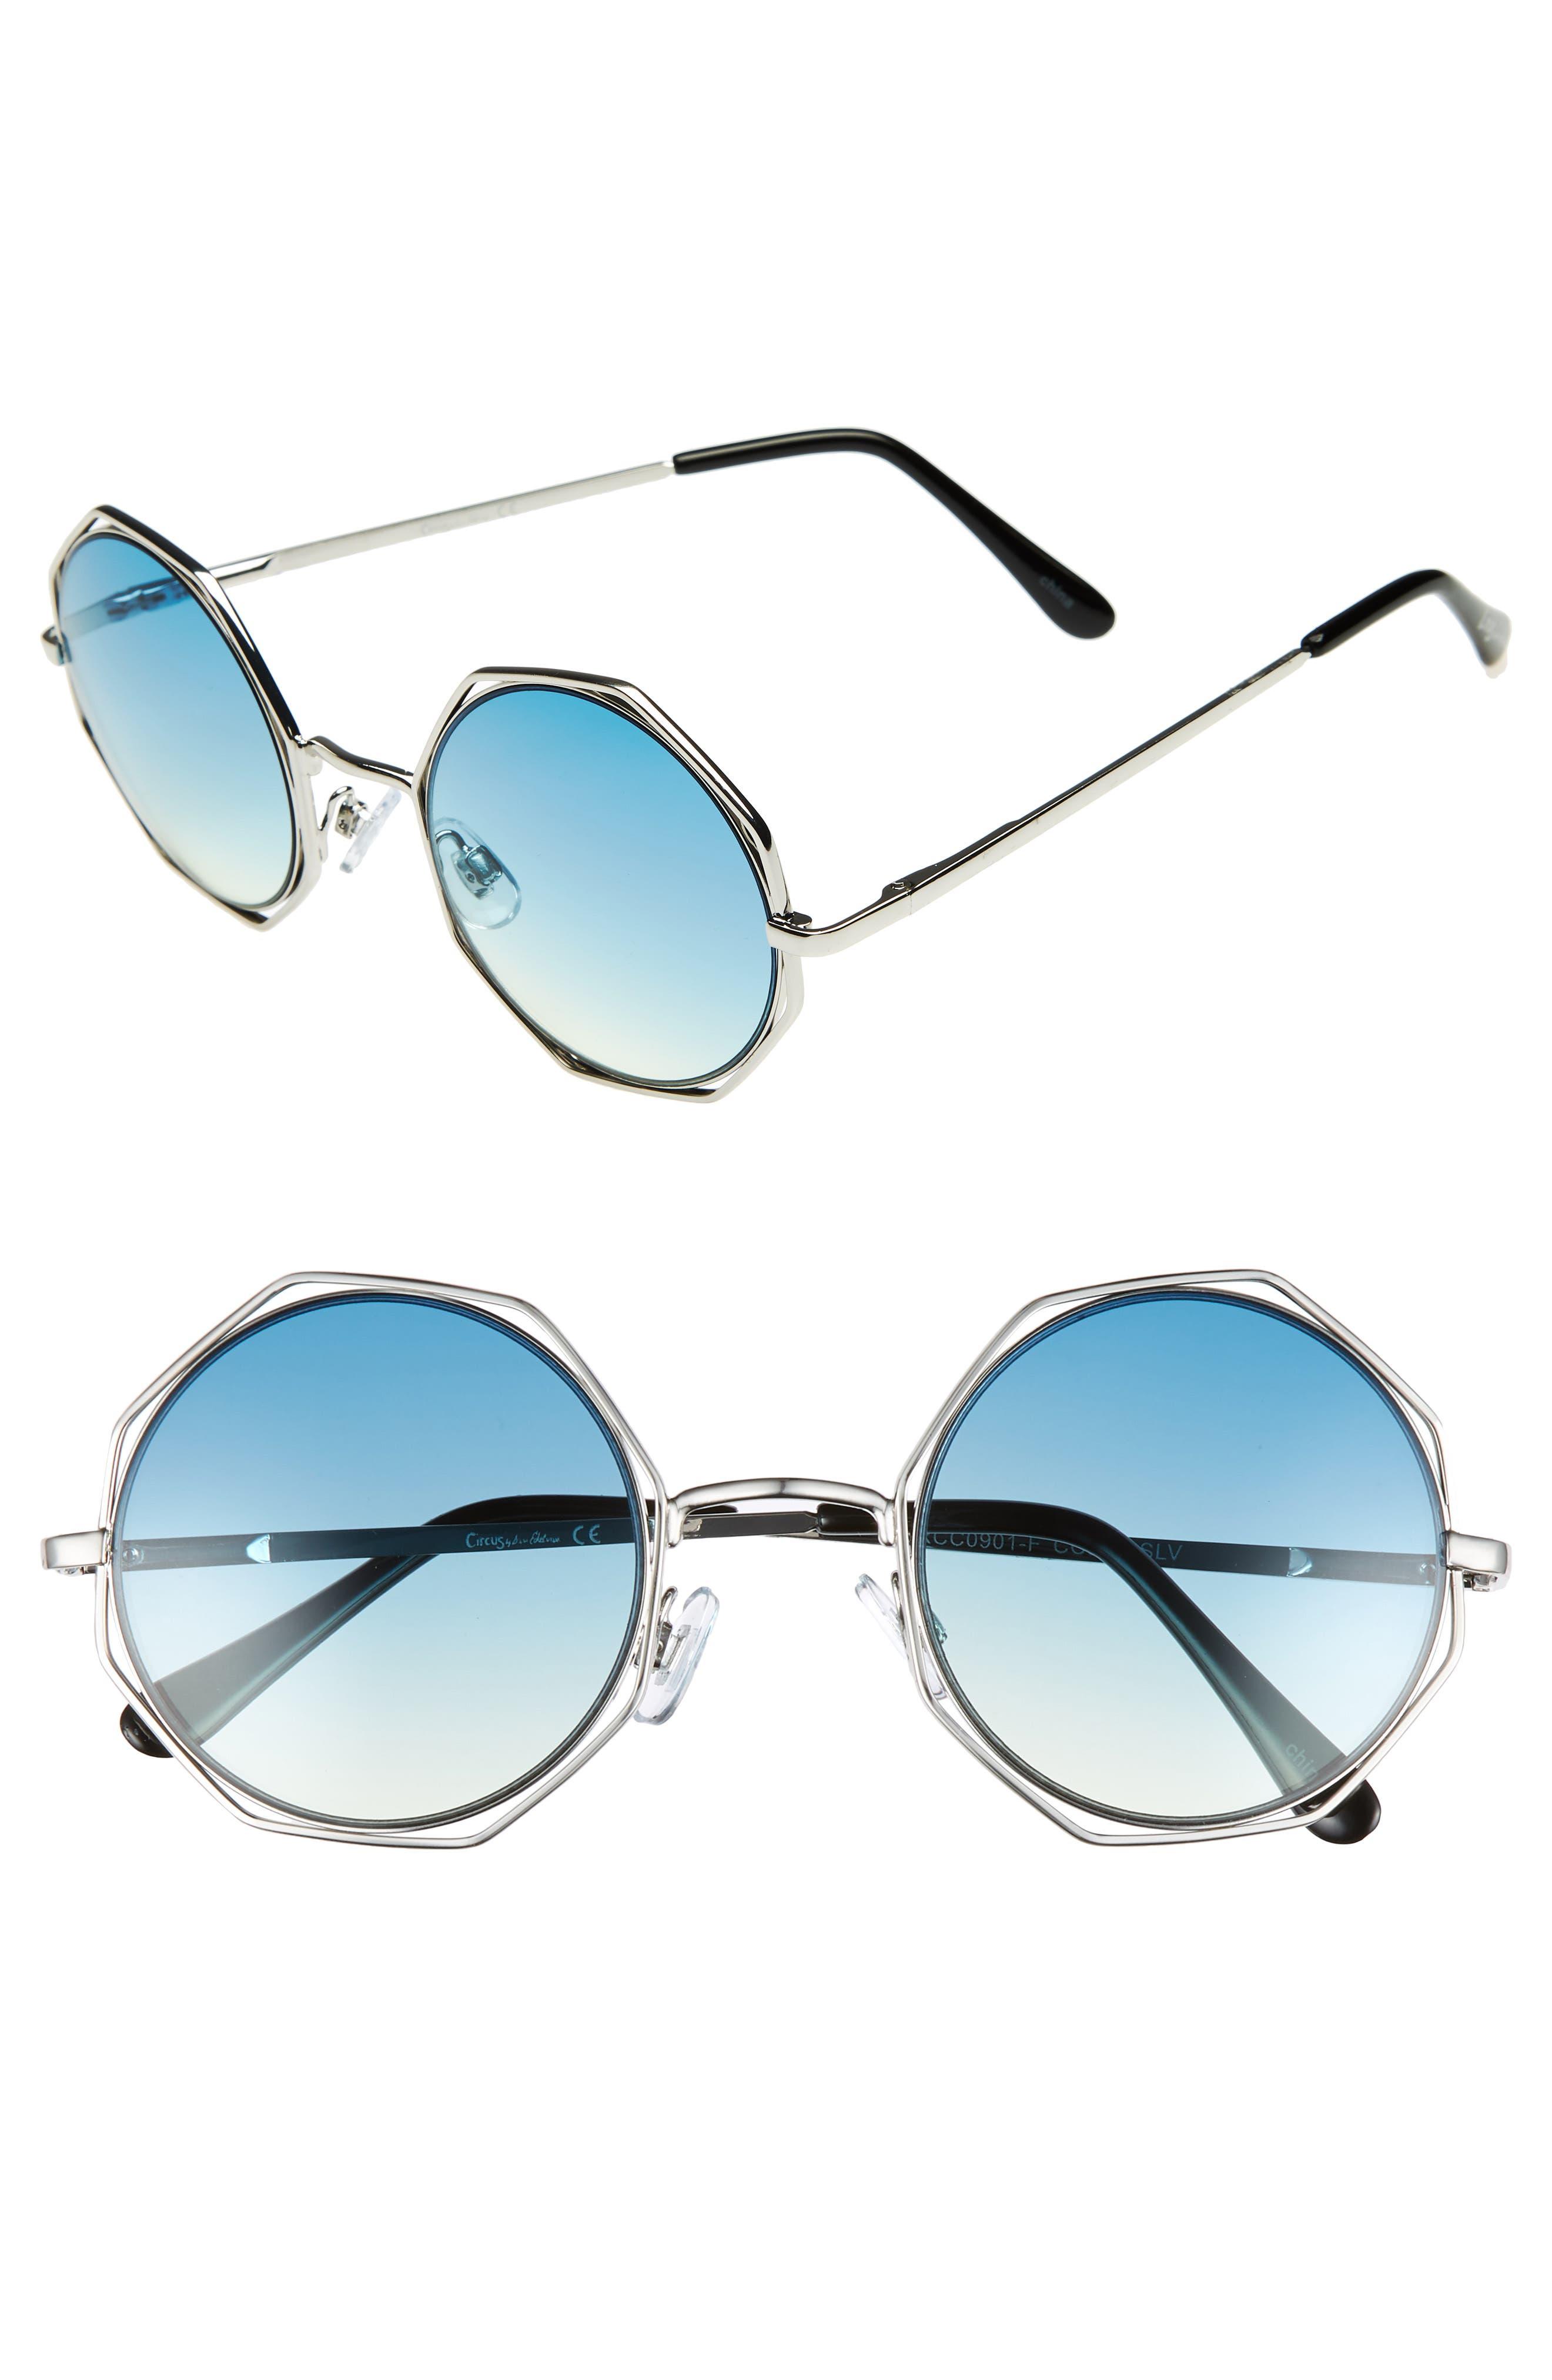 50mm Round Sunglasses,                             Main thumbnail 1, color,                             040